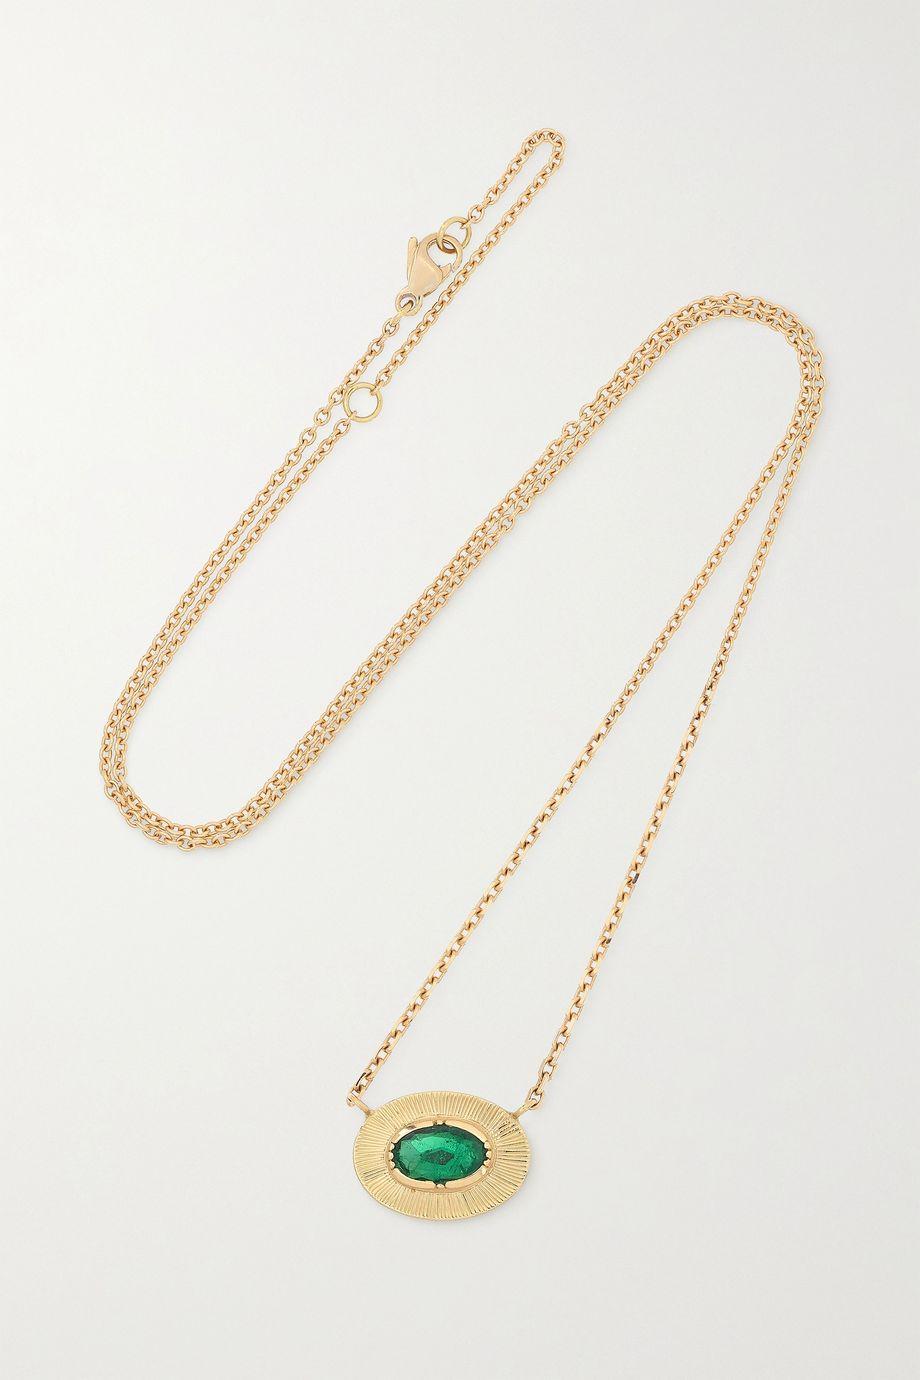 Brooke Gregson Ellipse Kette aus 18 Karat Gold mit Smaragd